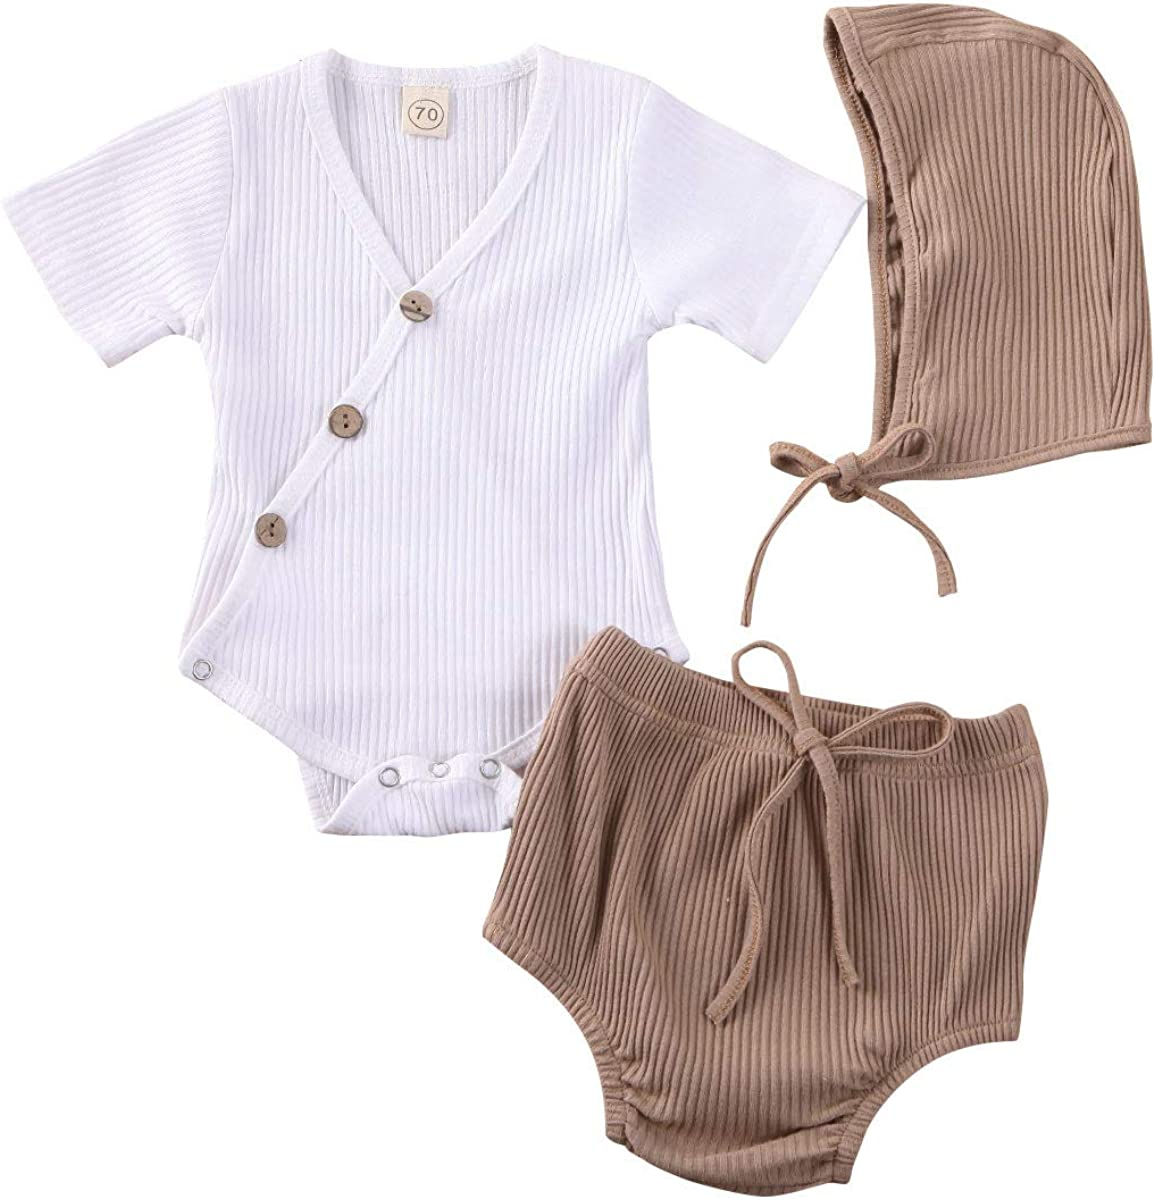 Muasaaluxi Unisex Newborn Baby Girls Boys Outfits Short Sleeve Romper Button Bodysuit Shorts Pants 2Pcs Clothes Set 0-18M